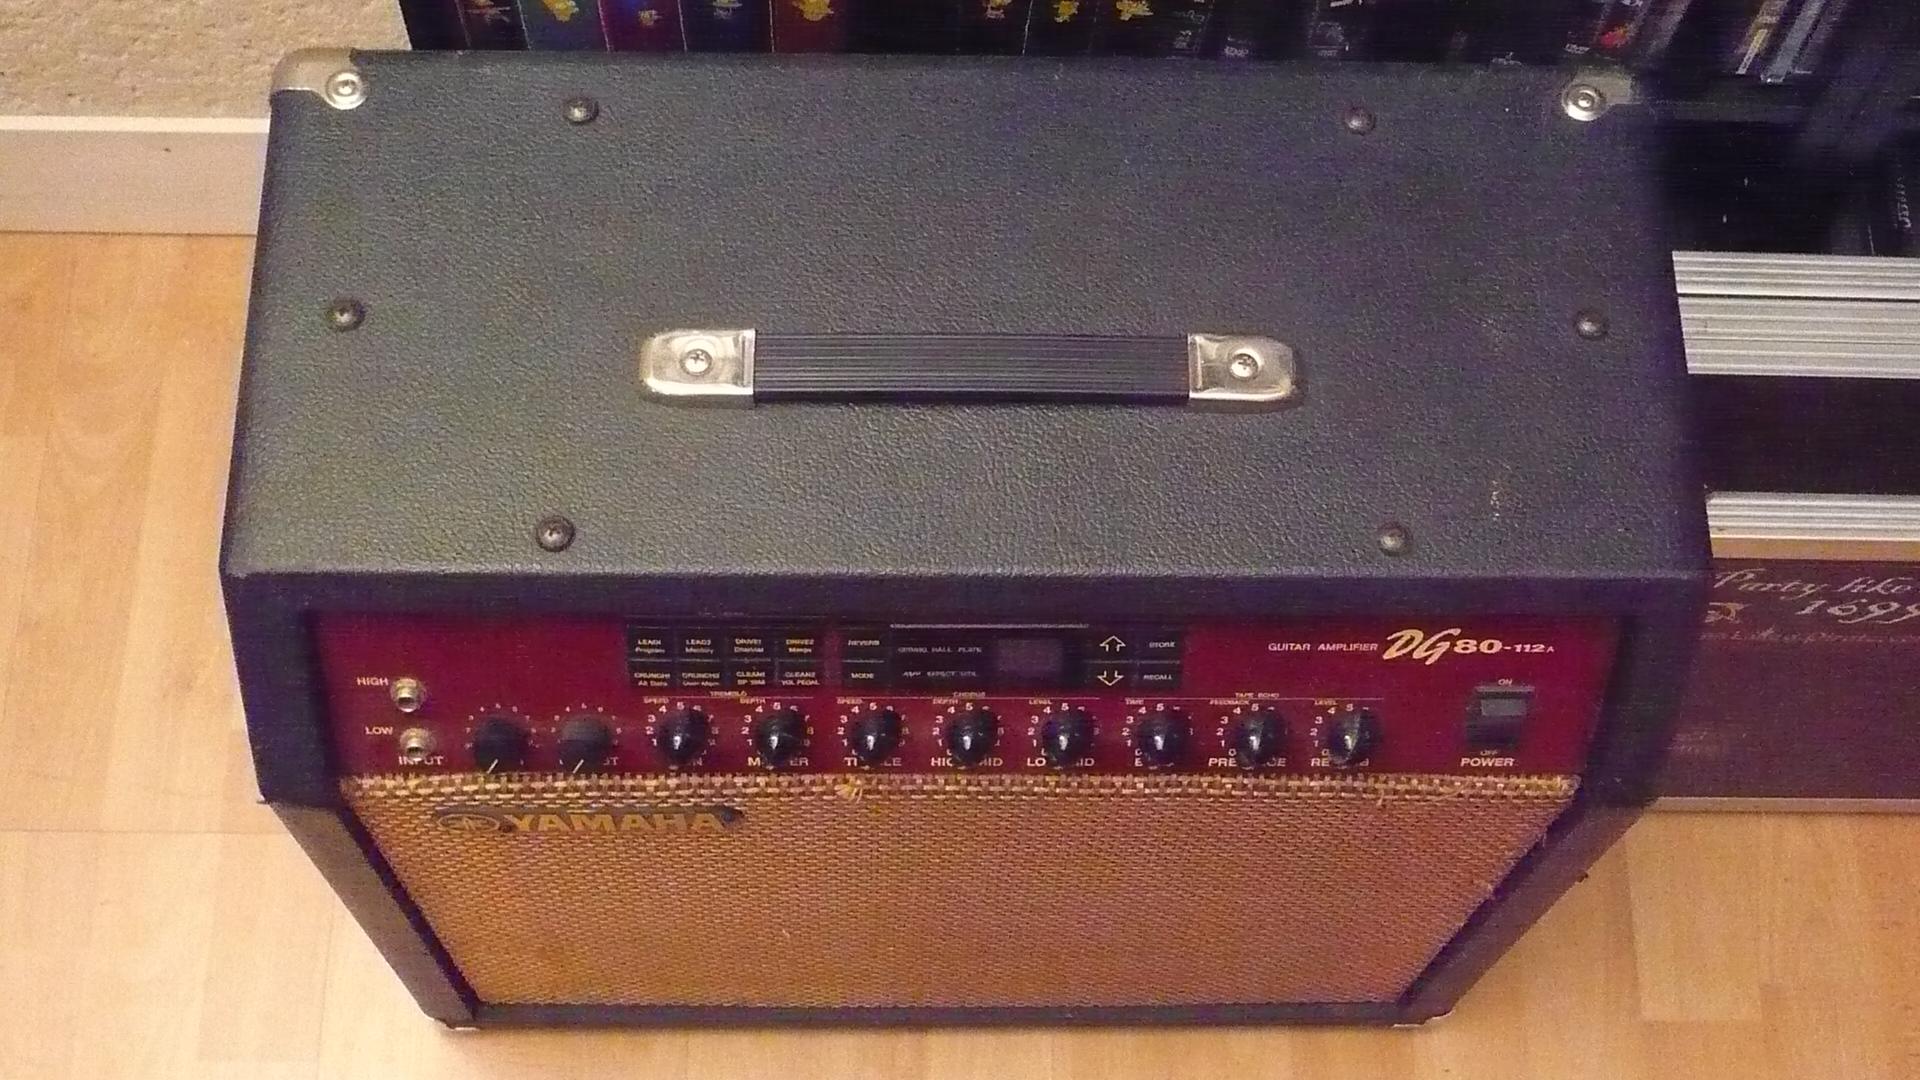 vends ampli guitare yamaha dg 80 1x12 cab ile de france. Black Bedroom Furniture Sets. Home Design Ideas